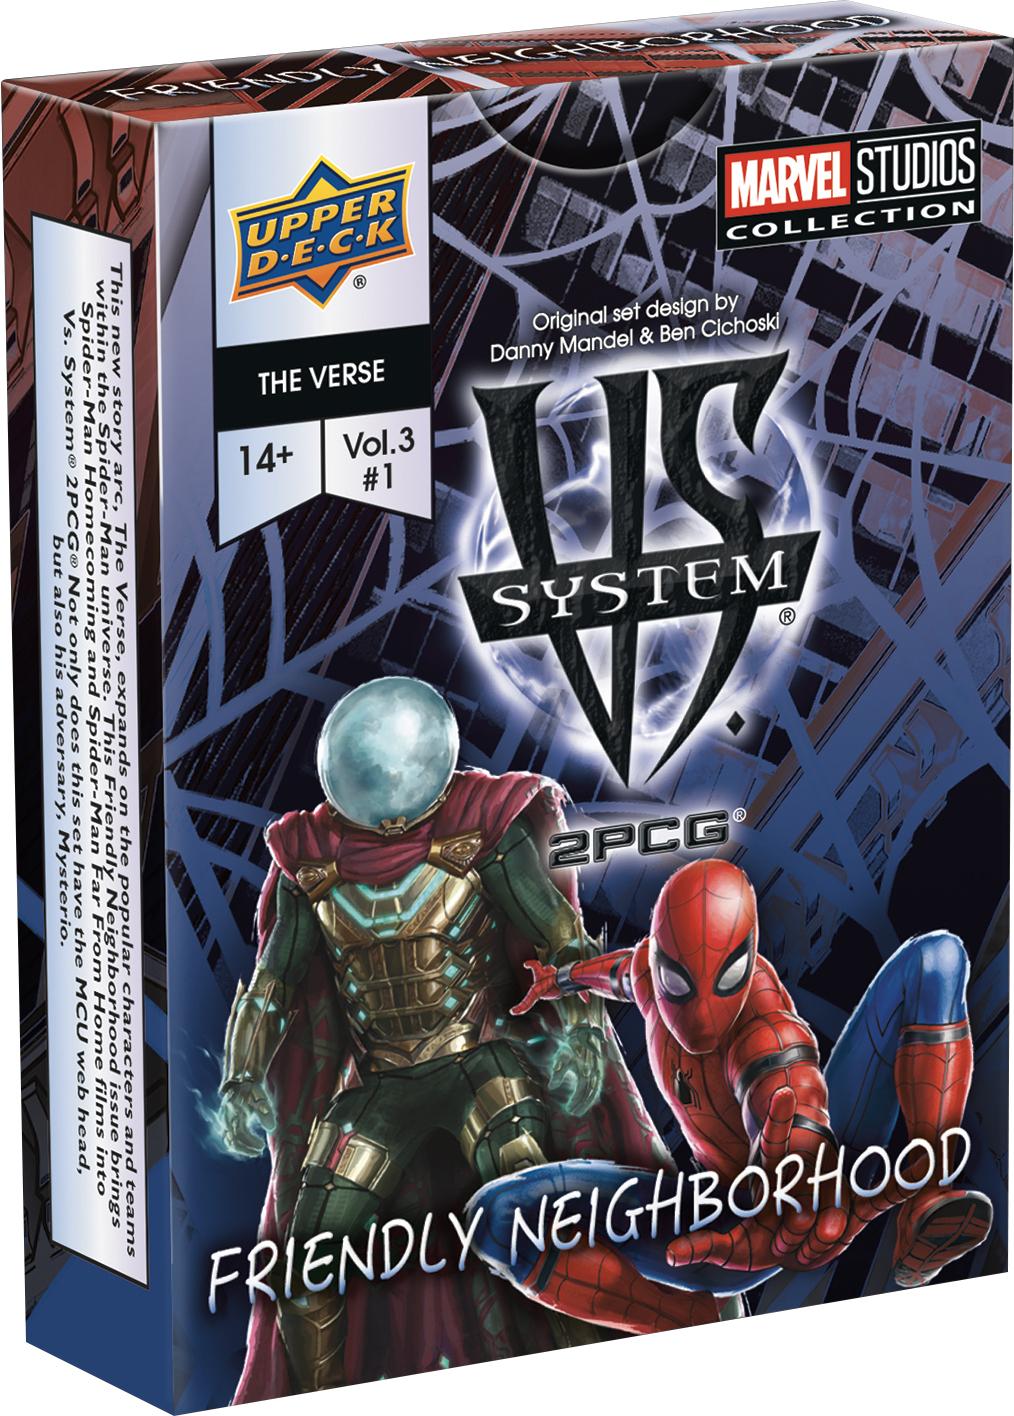 Vs System 2pcg: Marvel Friendly Neighborhood (1 Of 3)